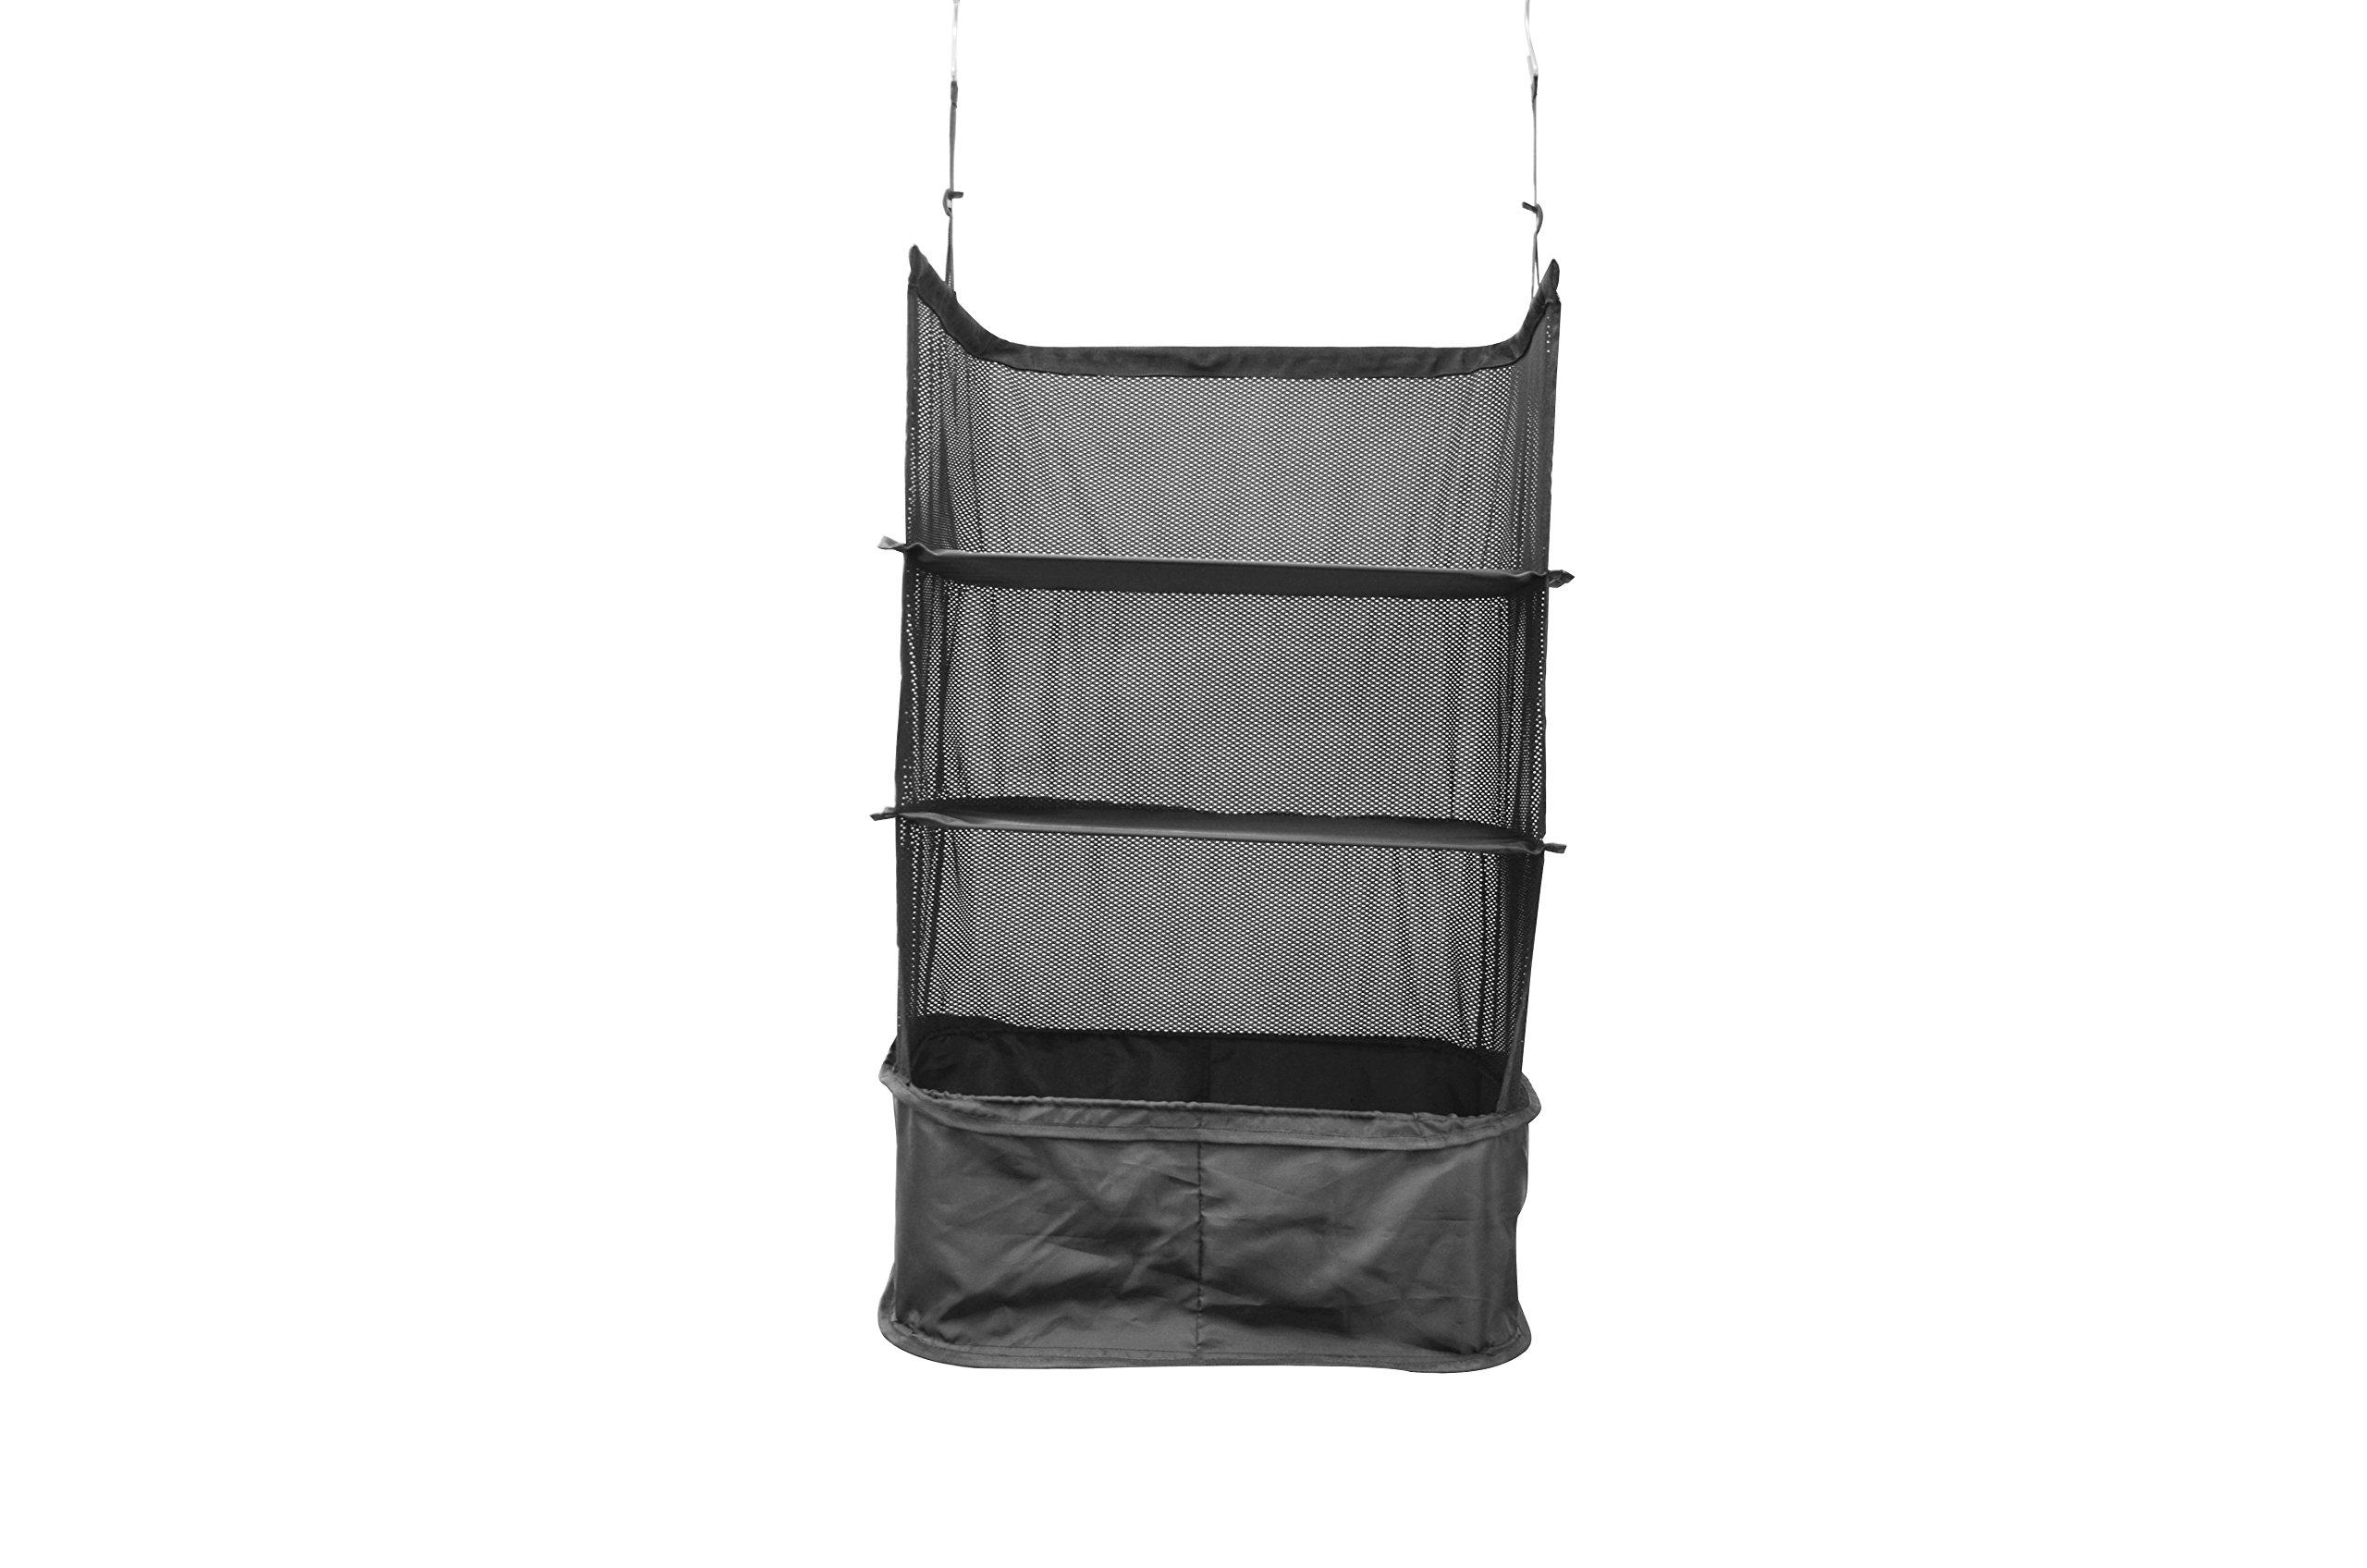 TopEva Folding Packable Suitcase Hanging Closet 3 - Shelves Organizer (Black)